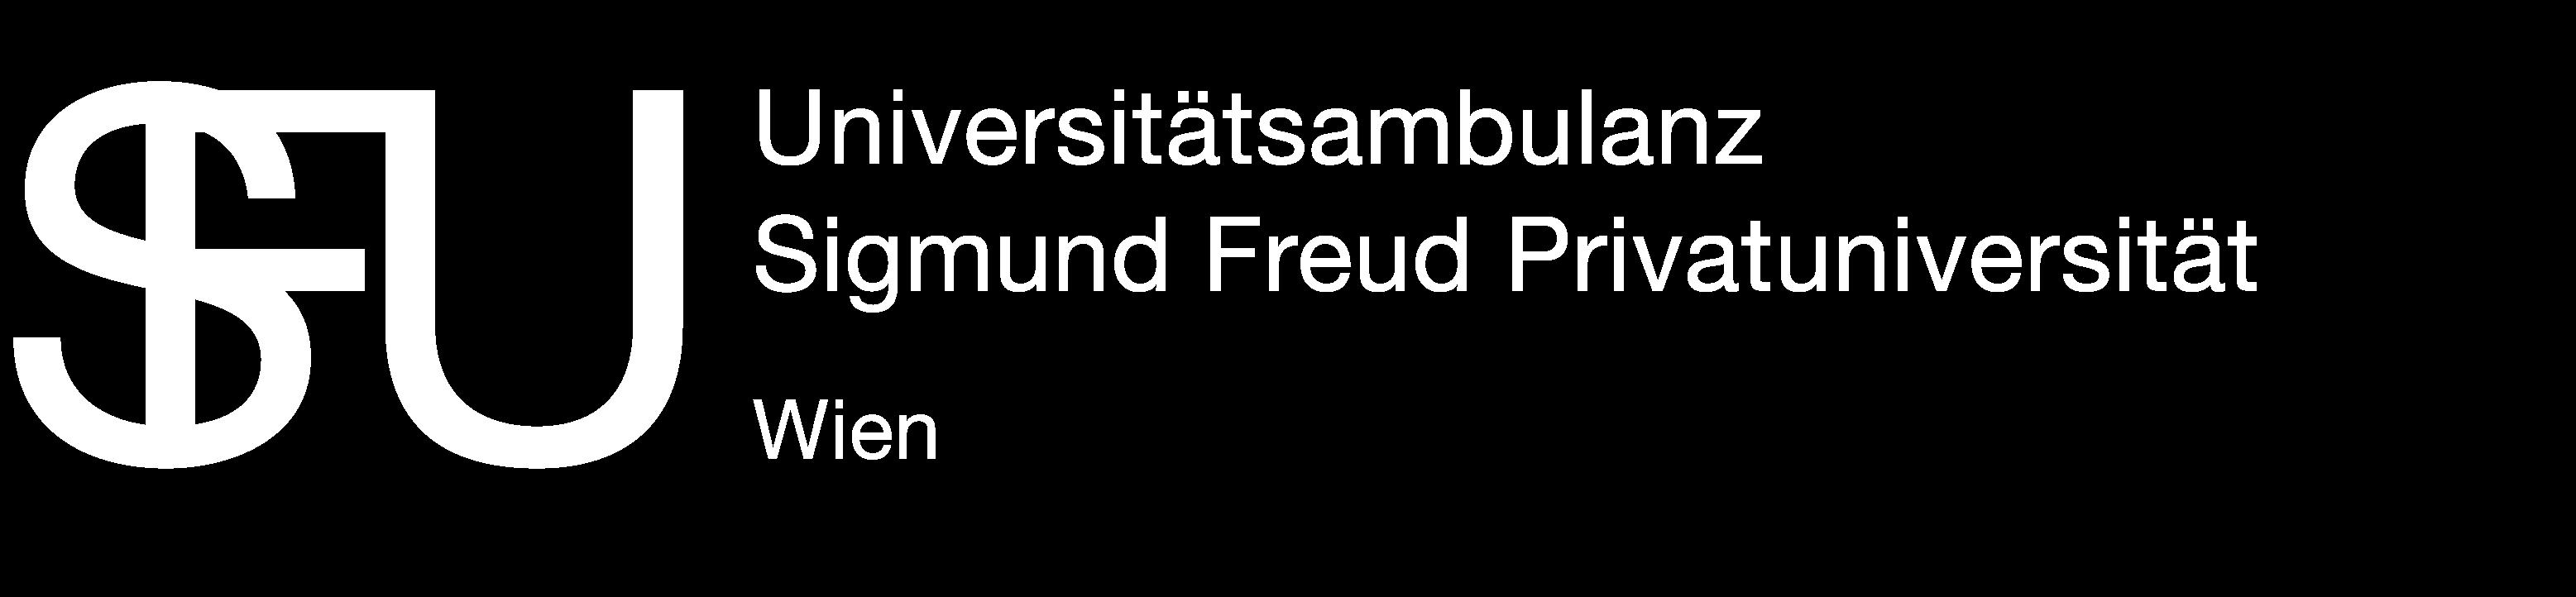 logos_fuerweb-10-04